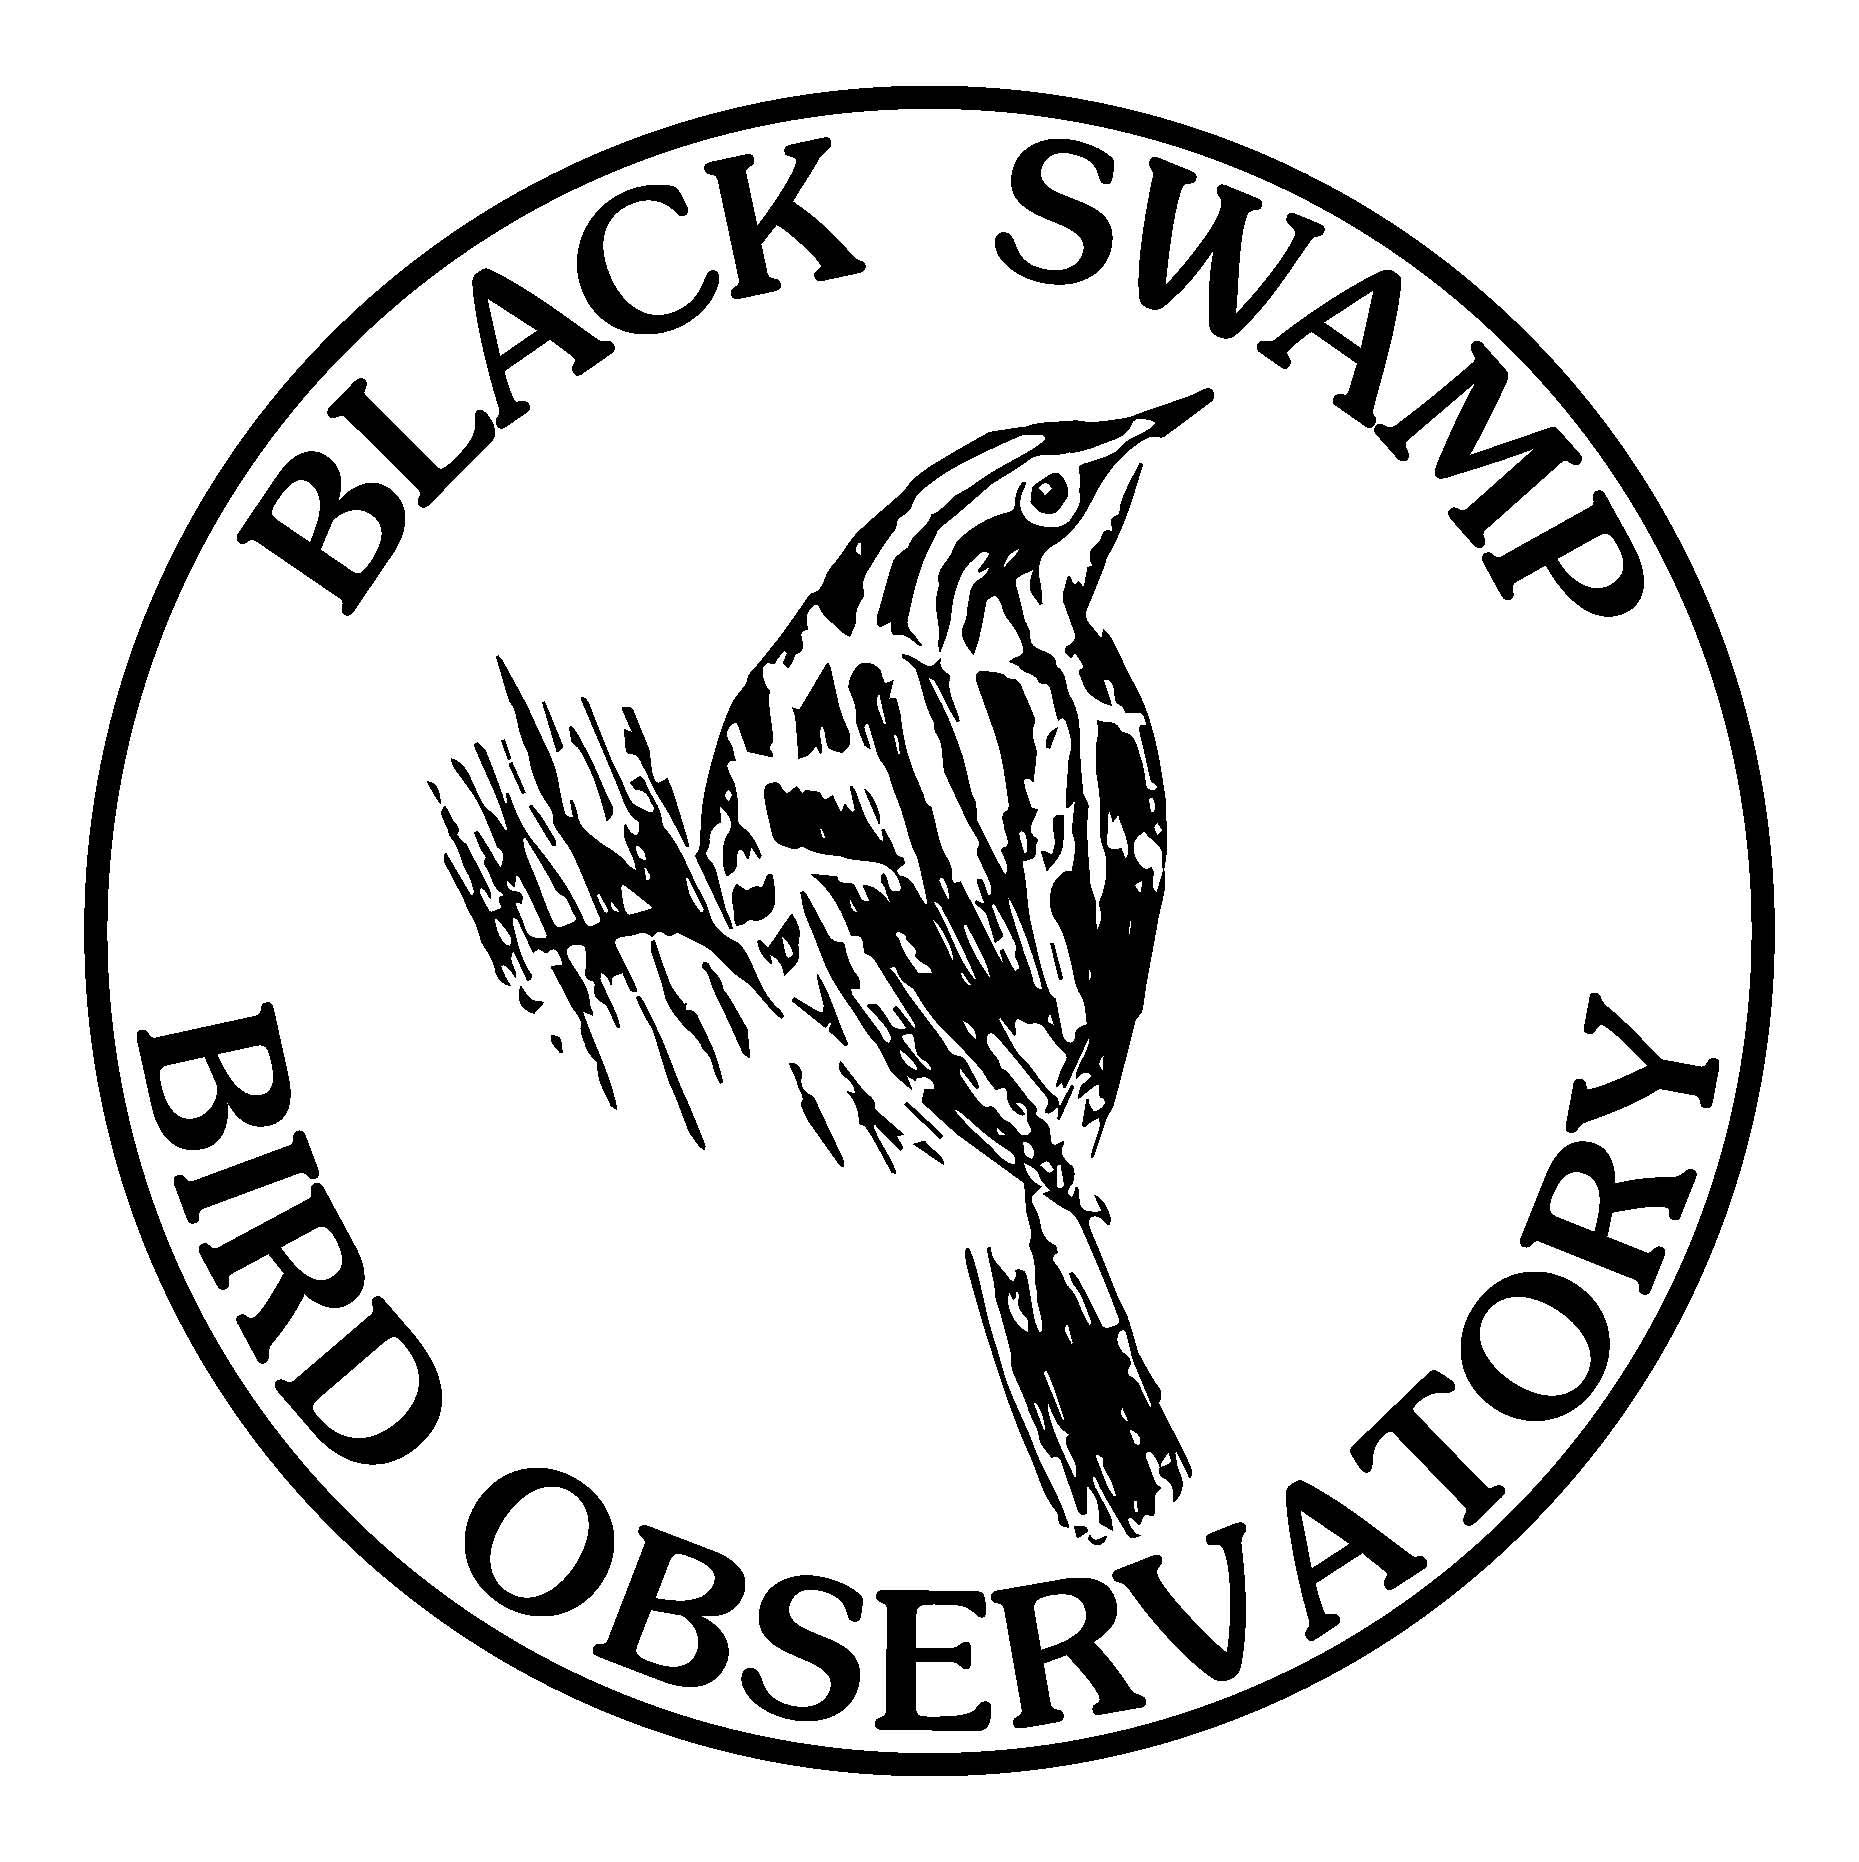 BSBO Senior Membership